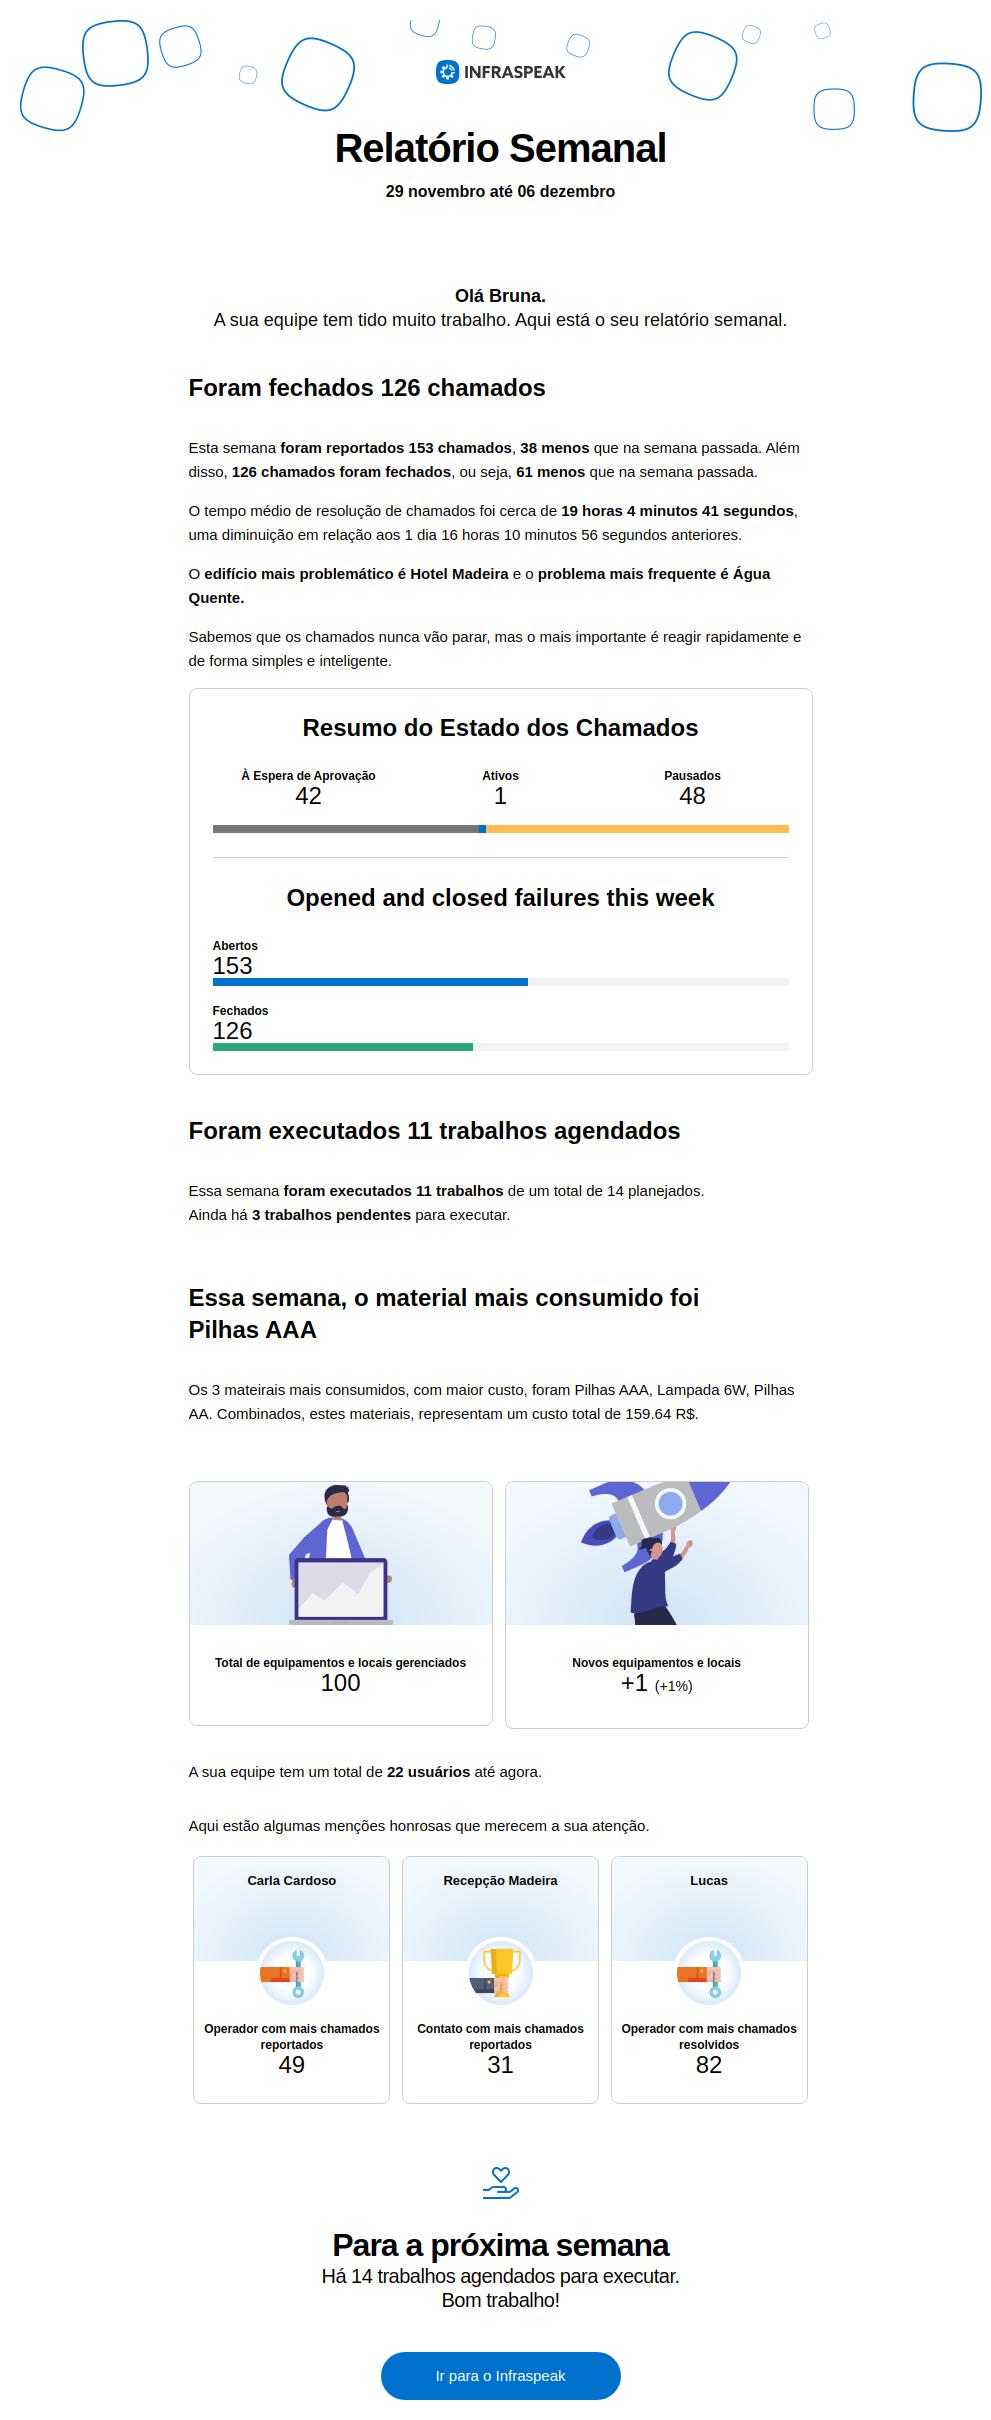 Relatório Semanal Inteligência Artificial Infraspeak